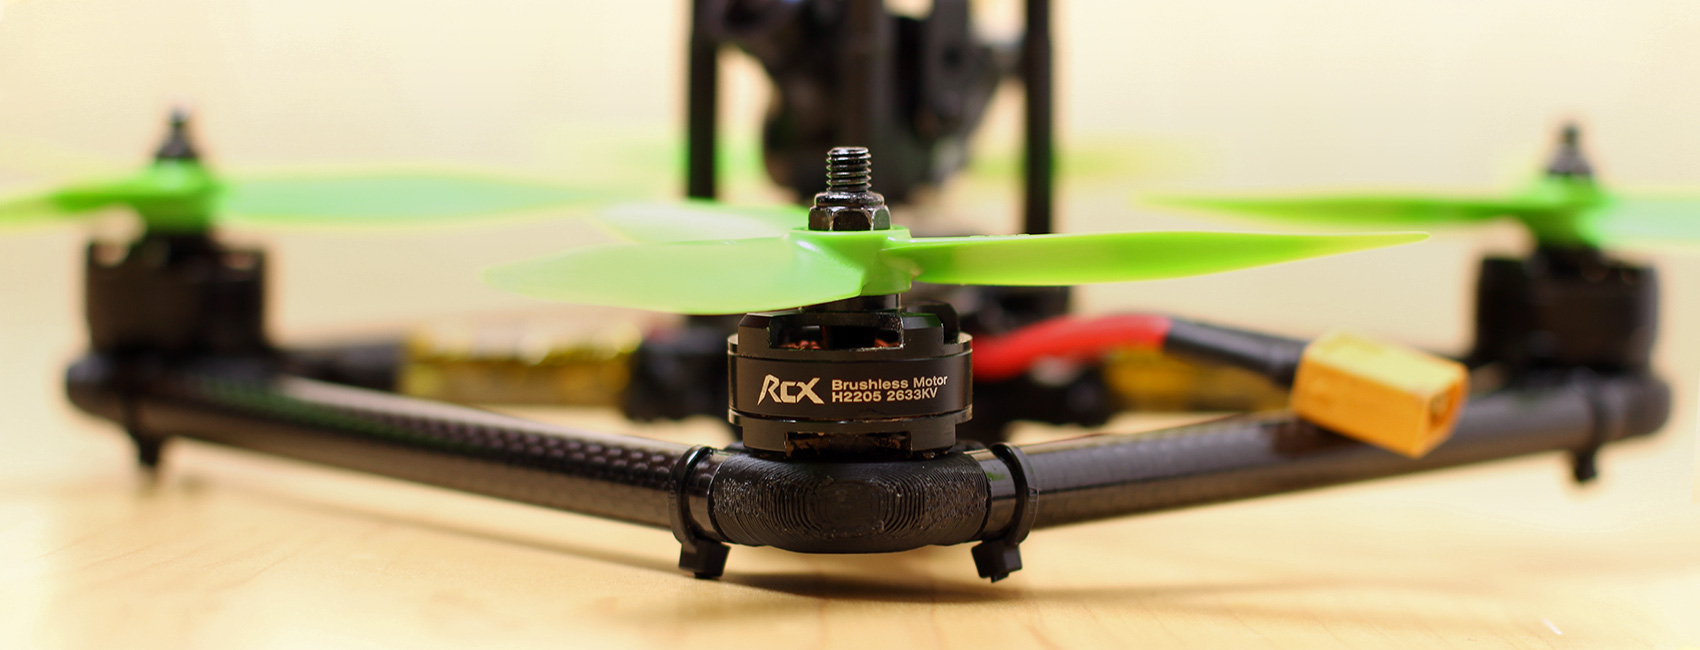 Making an Easy-Build FPV Racing Drone | Bresslergroup blog